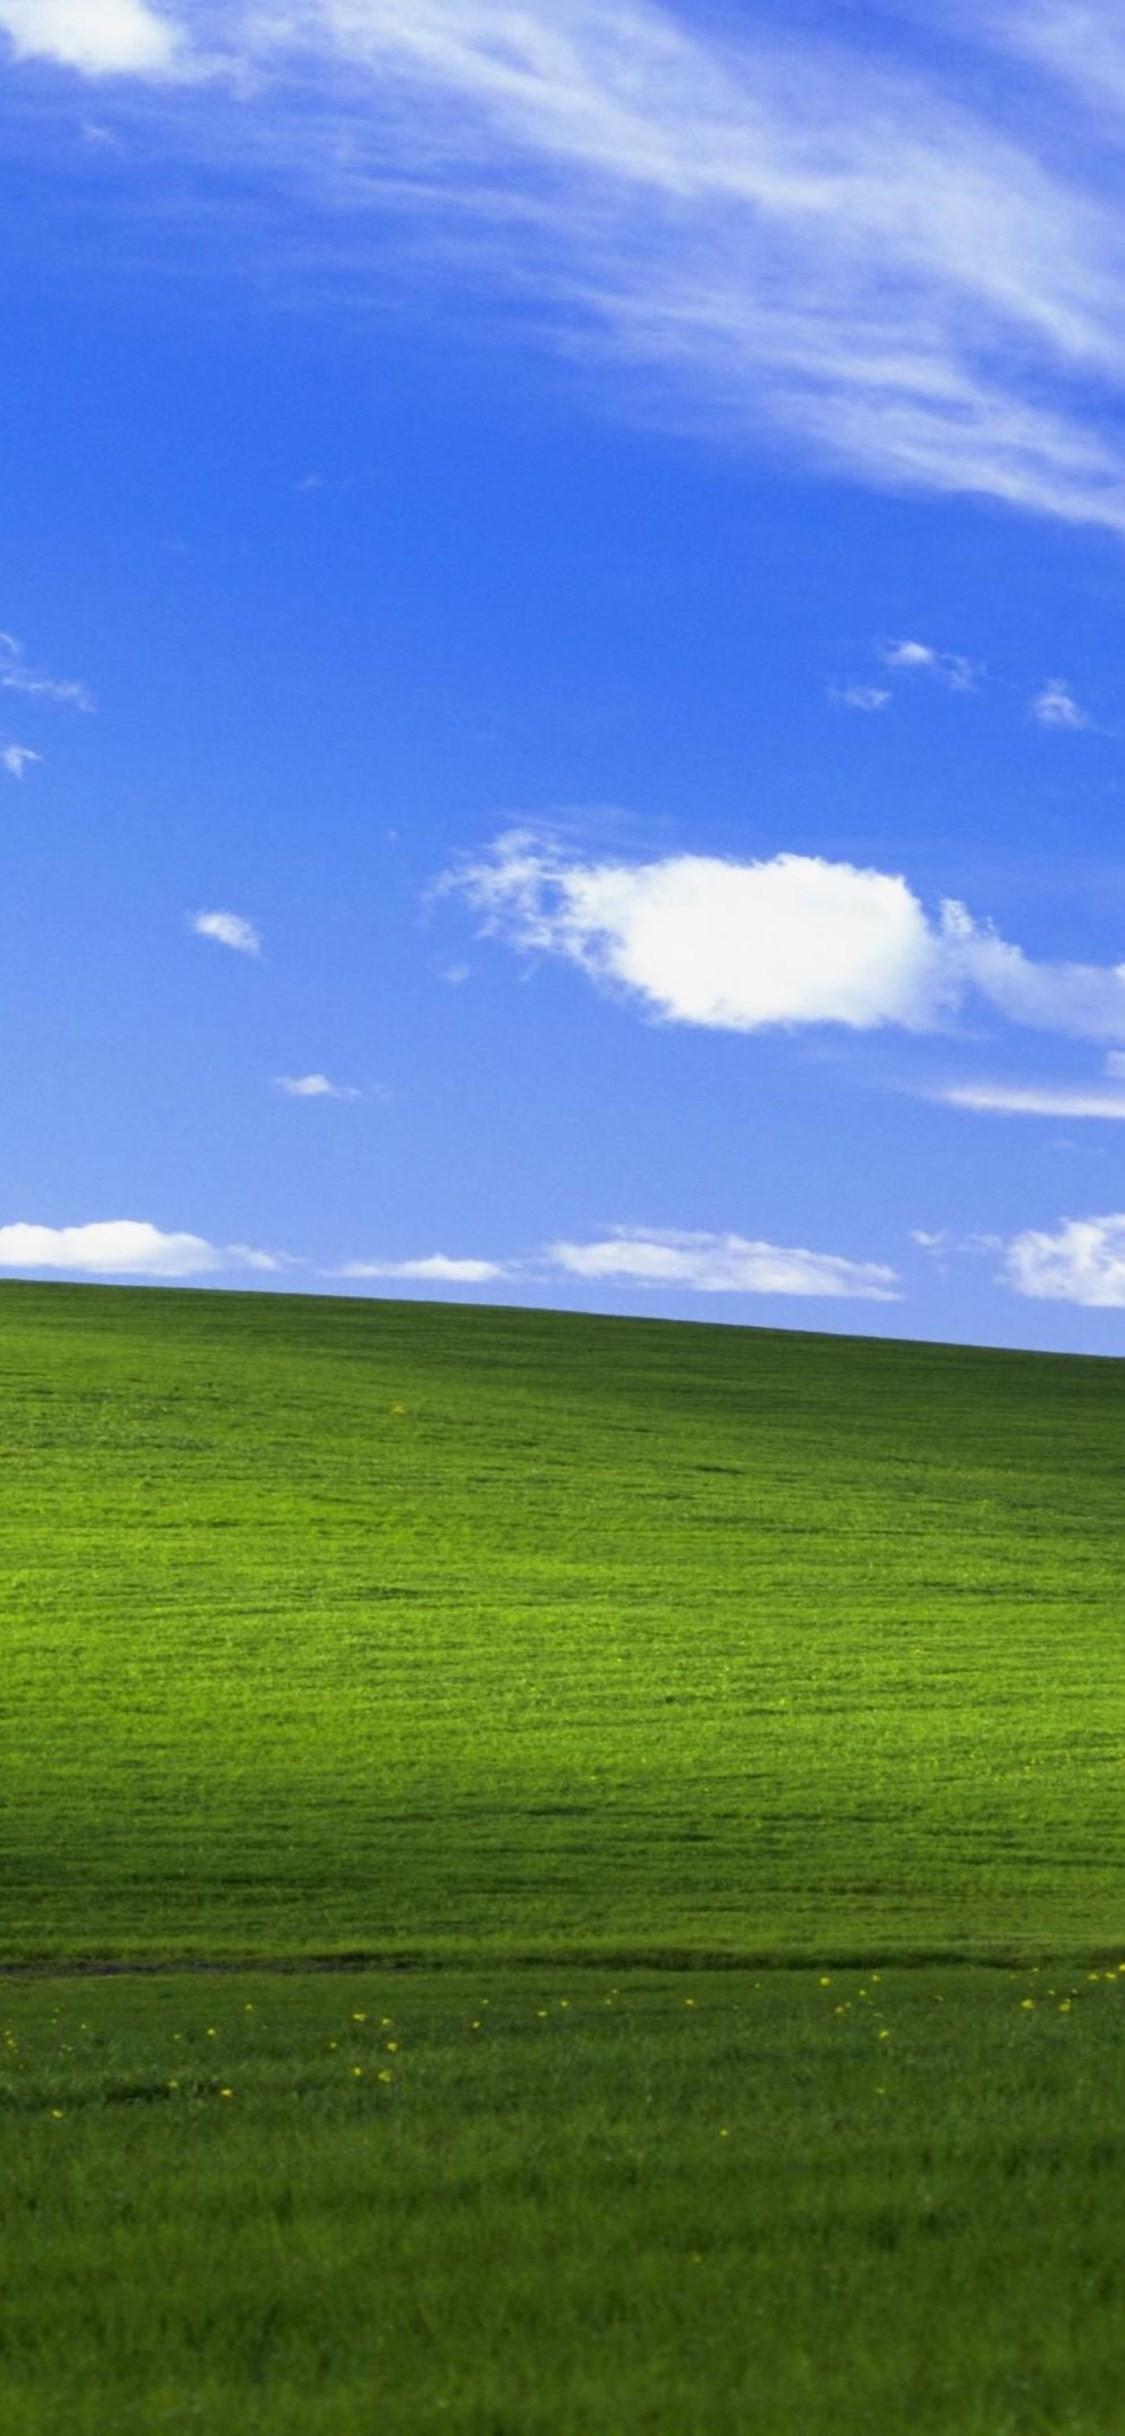 Windows Xp Wallpaper Bliss 54 Images